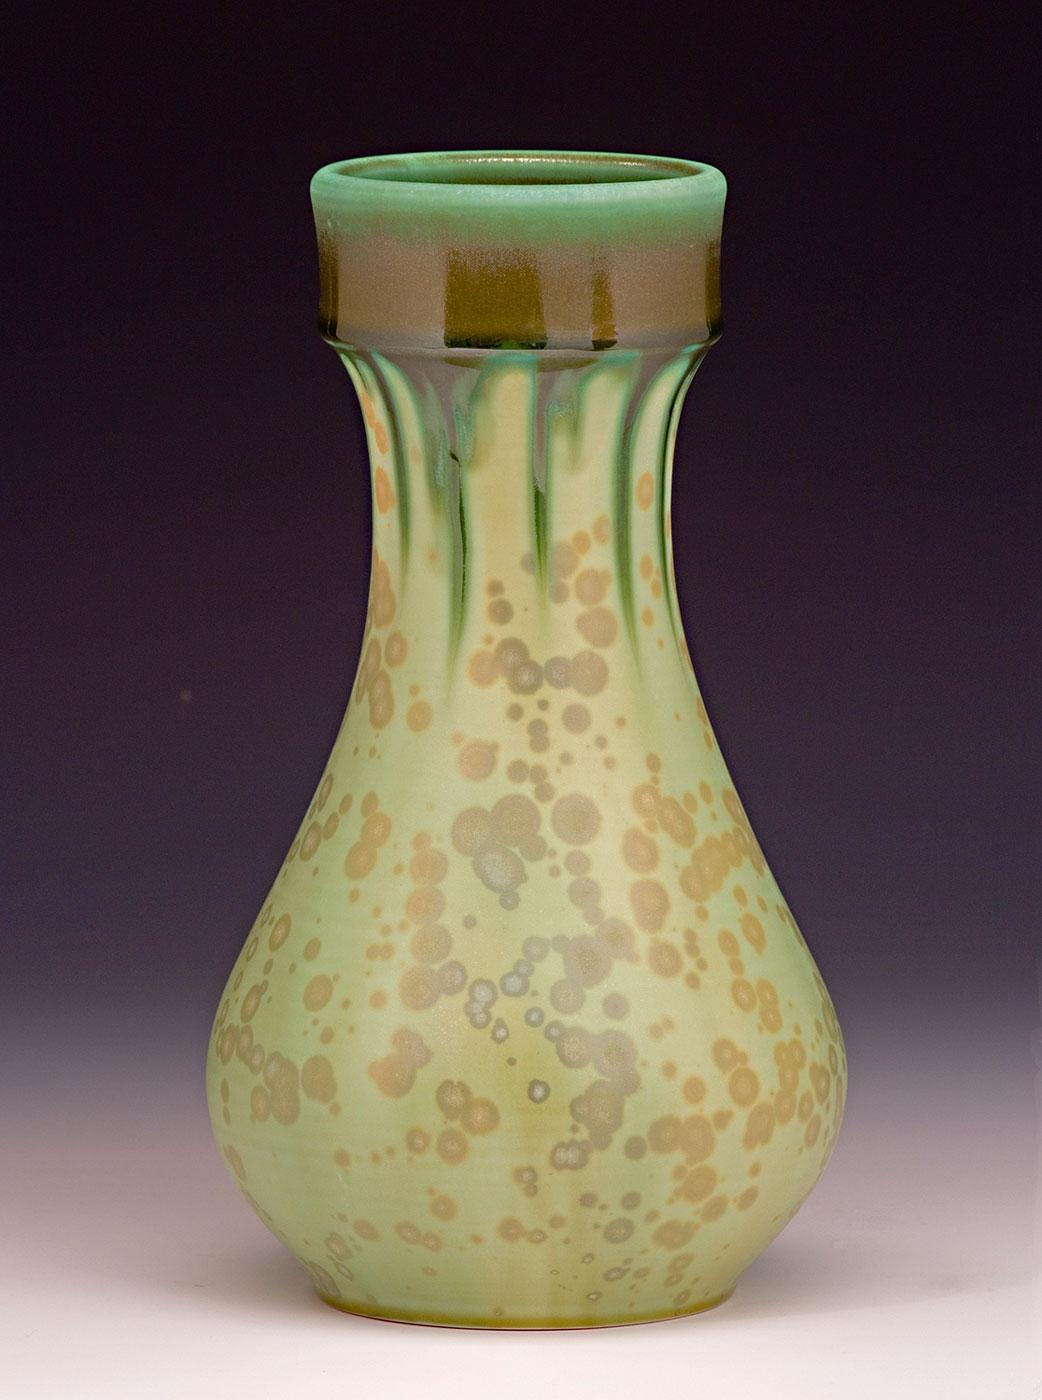 Art-Pottery-Vase-spring-green-matte-molybdenum-crystalline-Samantha-Henneke.jpg